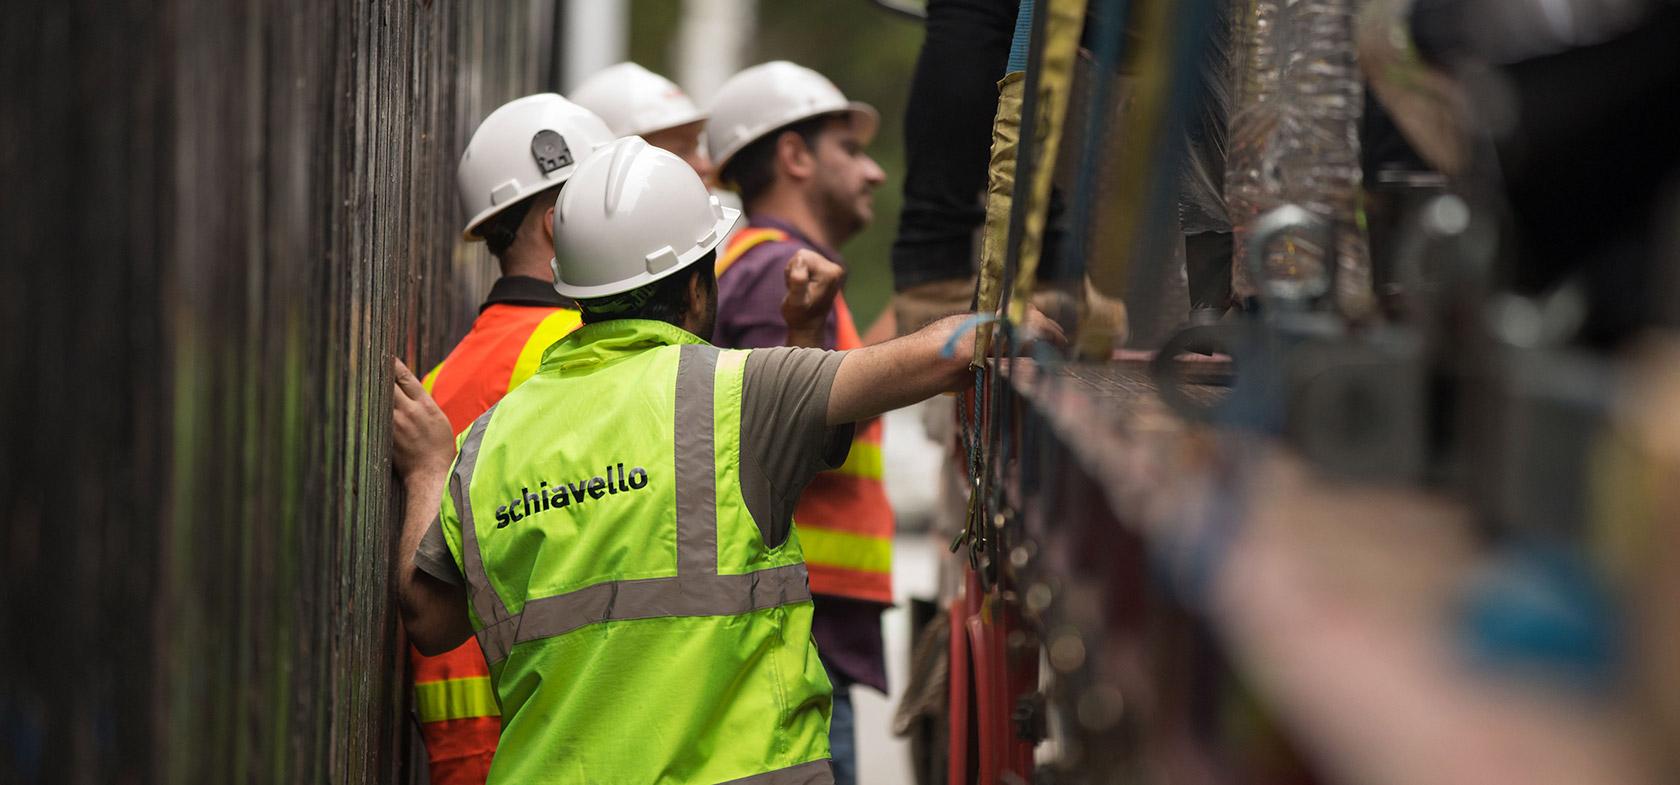 schiavello employees loading truck modular construction